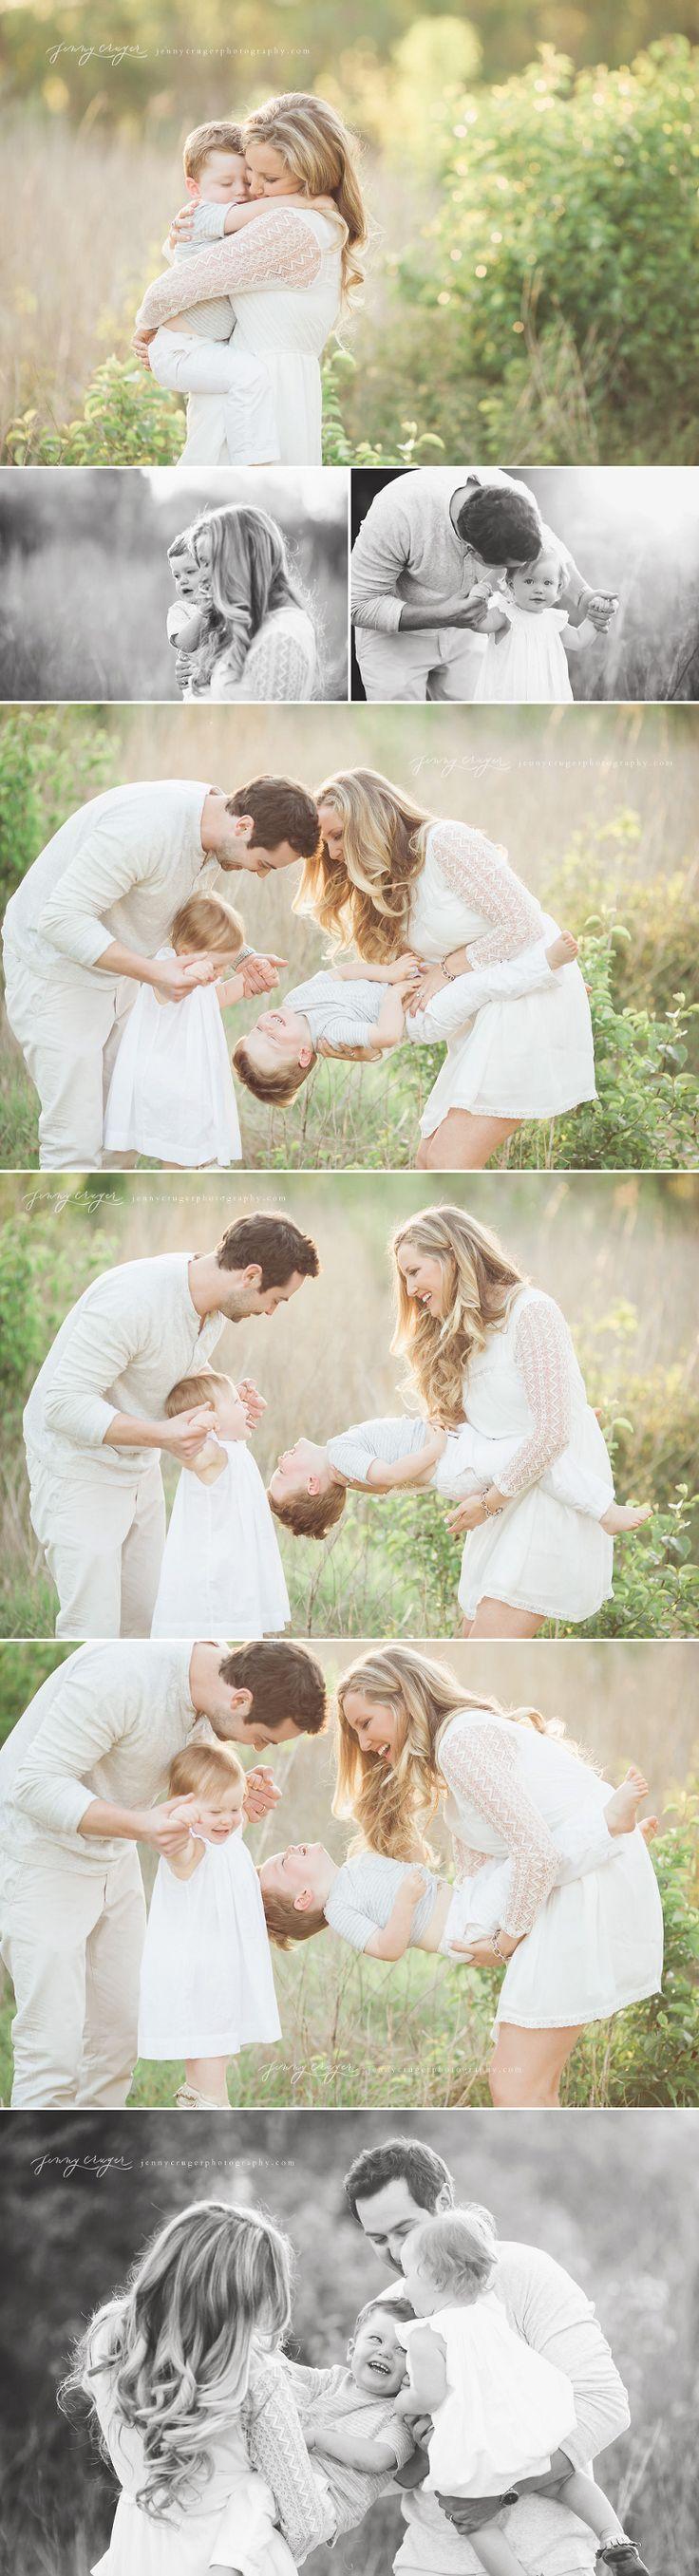 The Perkins Family | Nashville Family Photographer